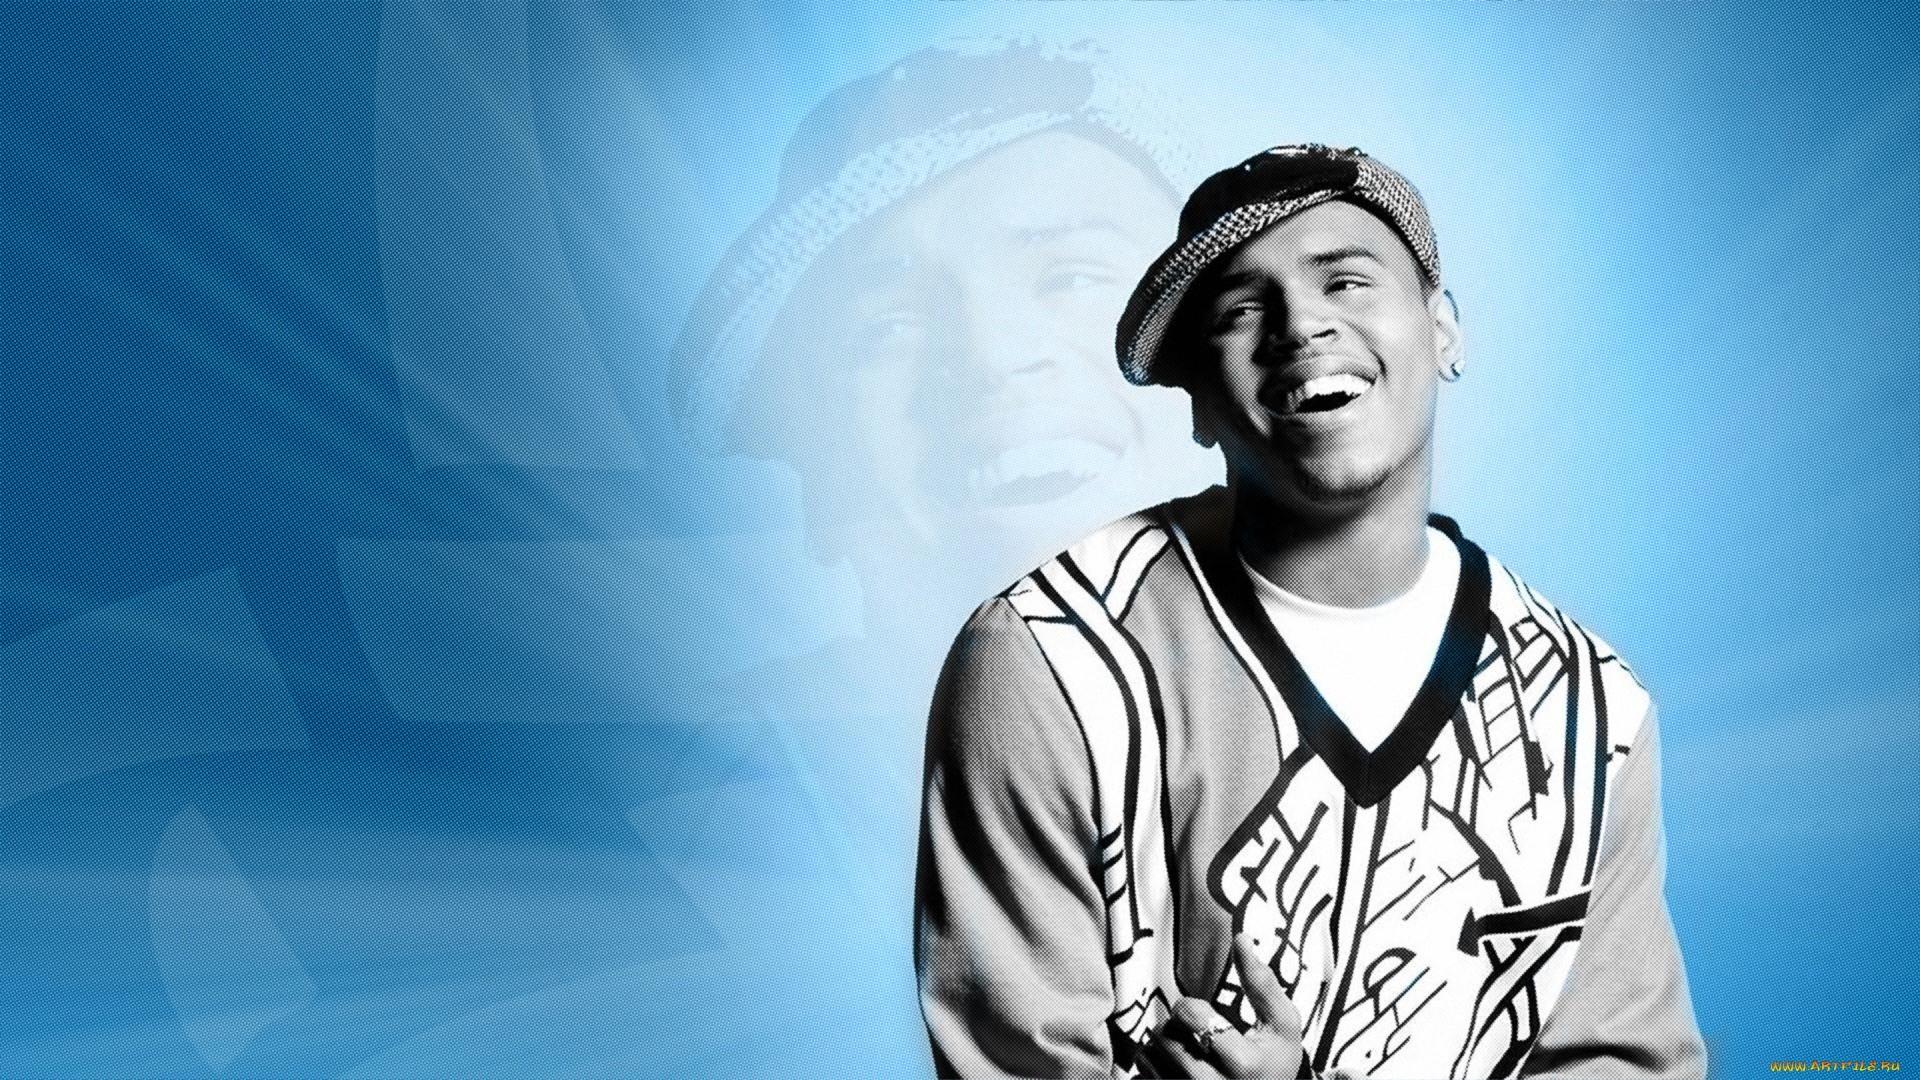 Chris Brown HD Wallpaper